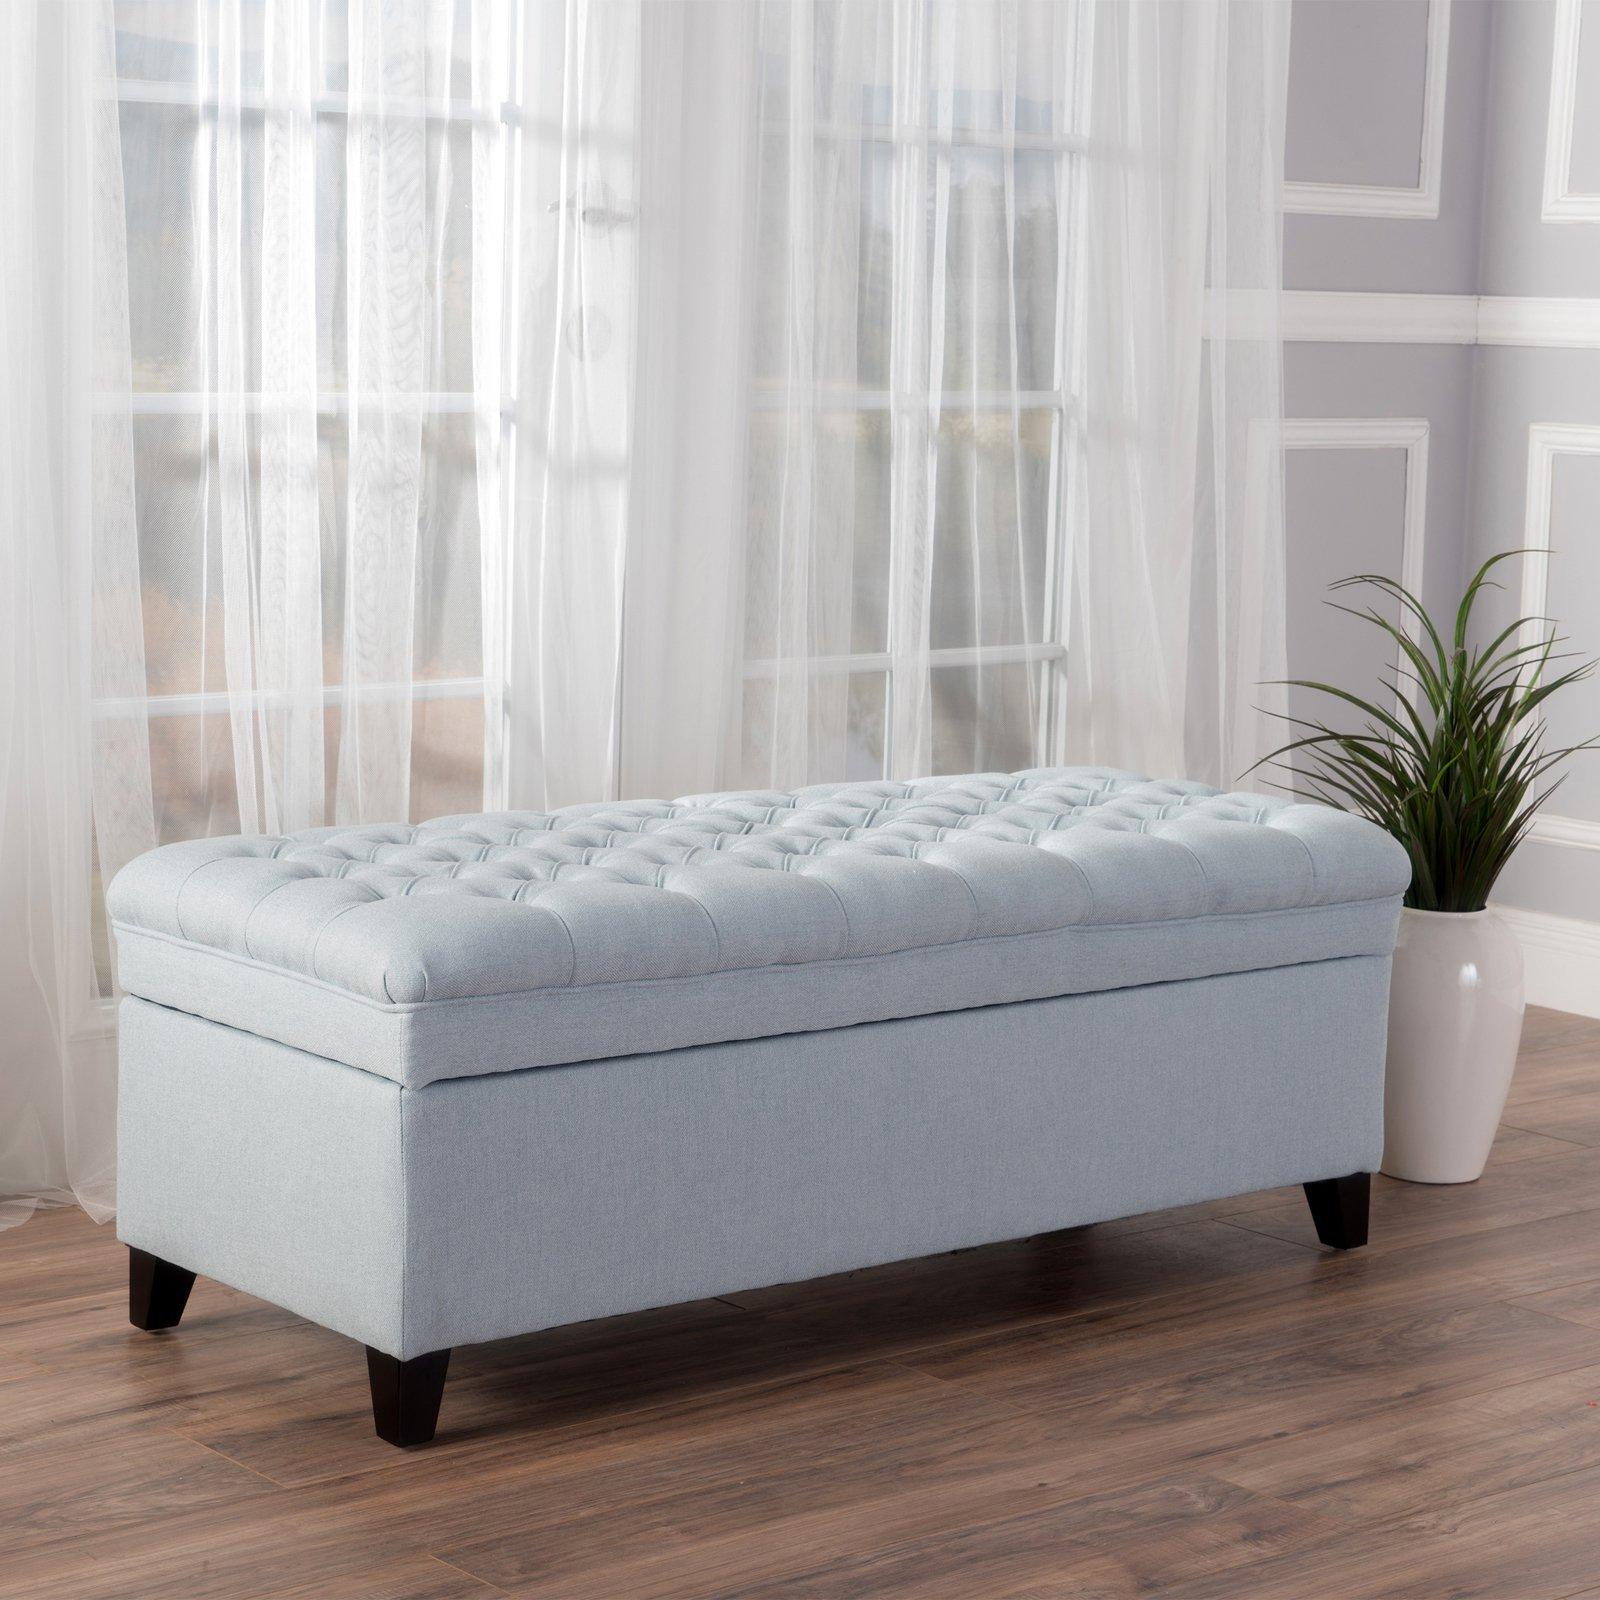 Logan Fabric Storage Indoor Bench